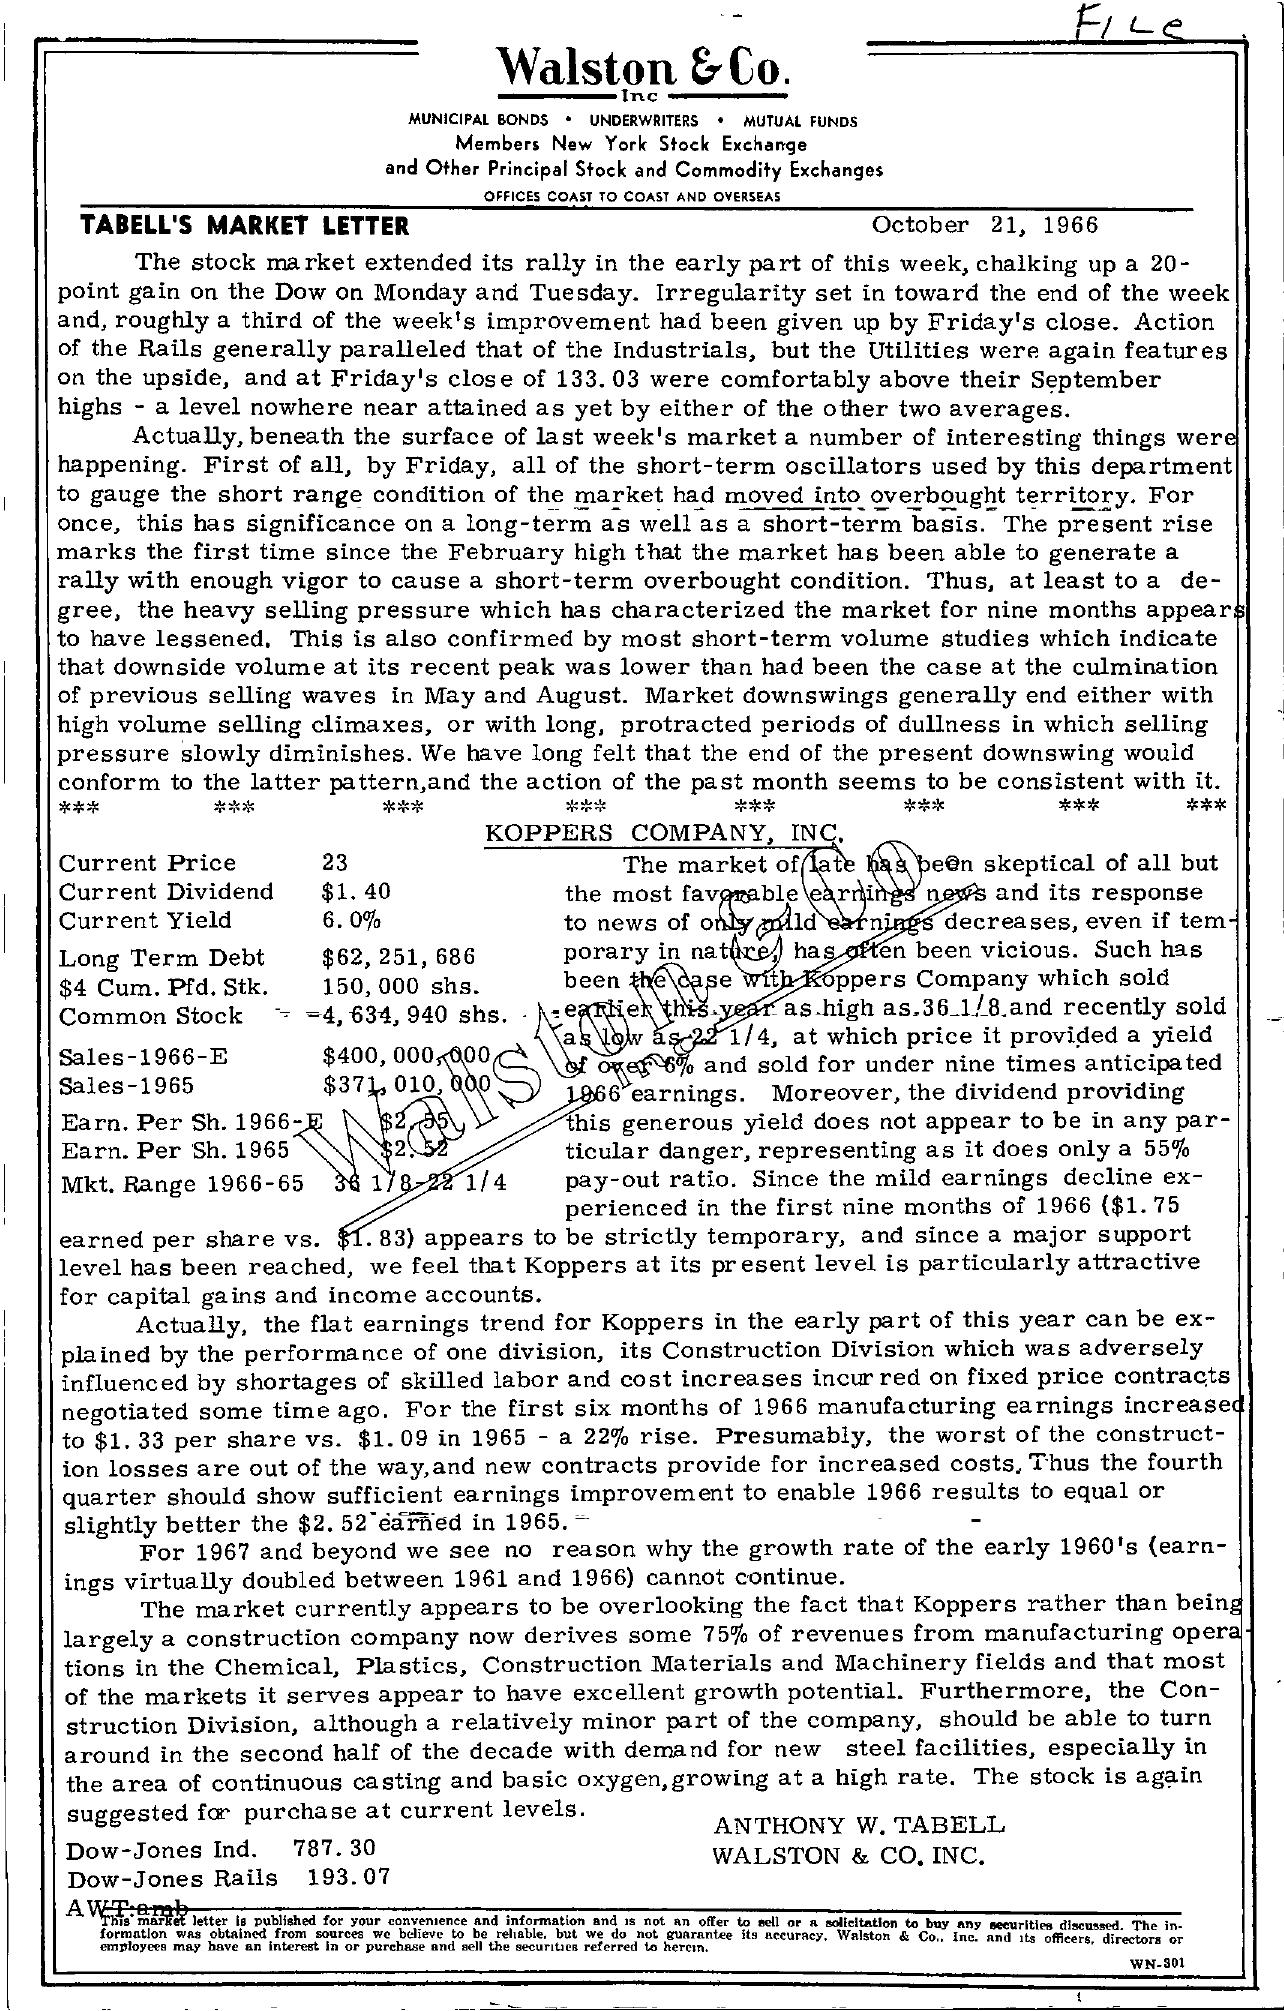 Tabell's Market Letter - October 21, 1966